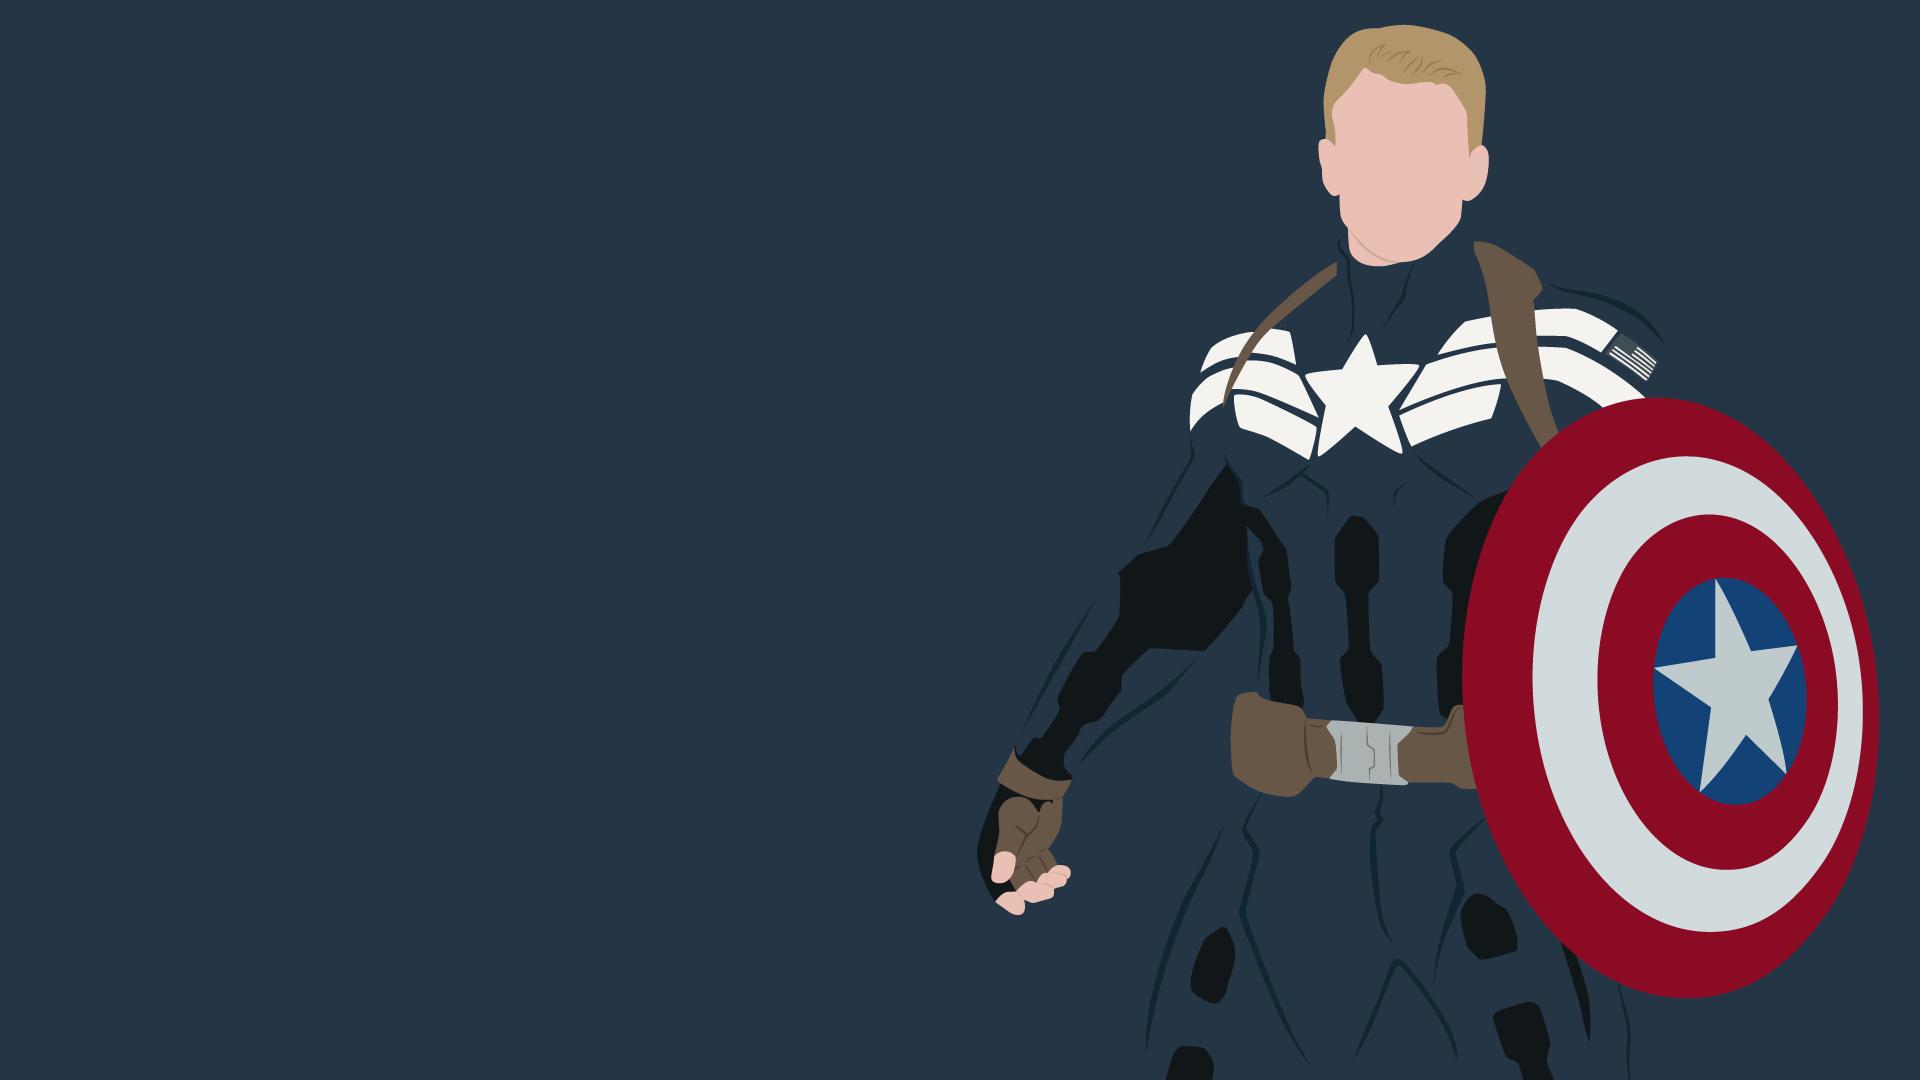 Captain America Wallpapers Desktop Background - Myomlife.com